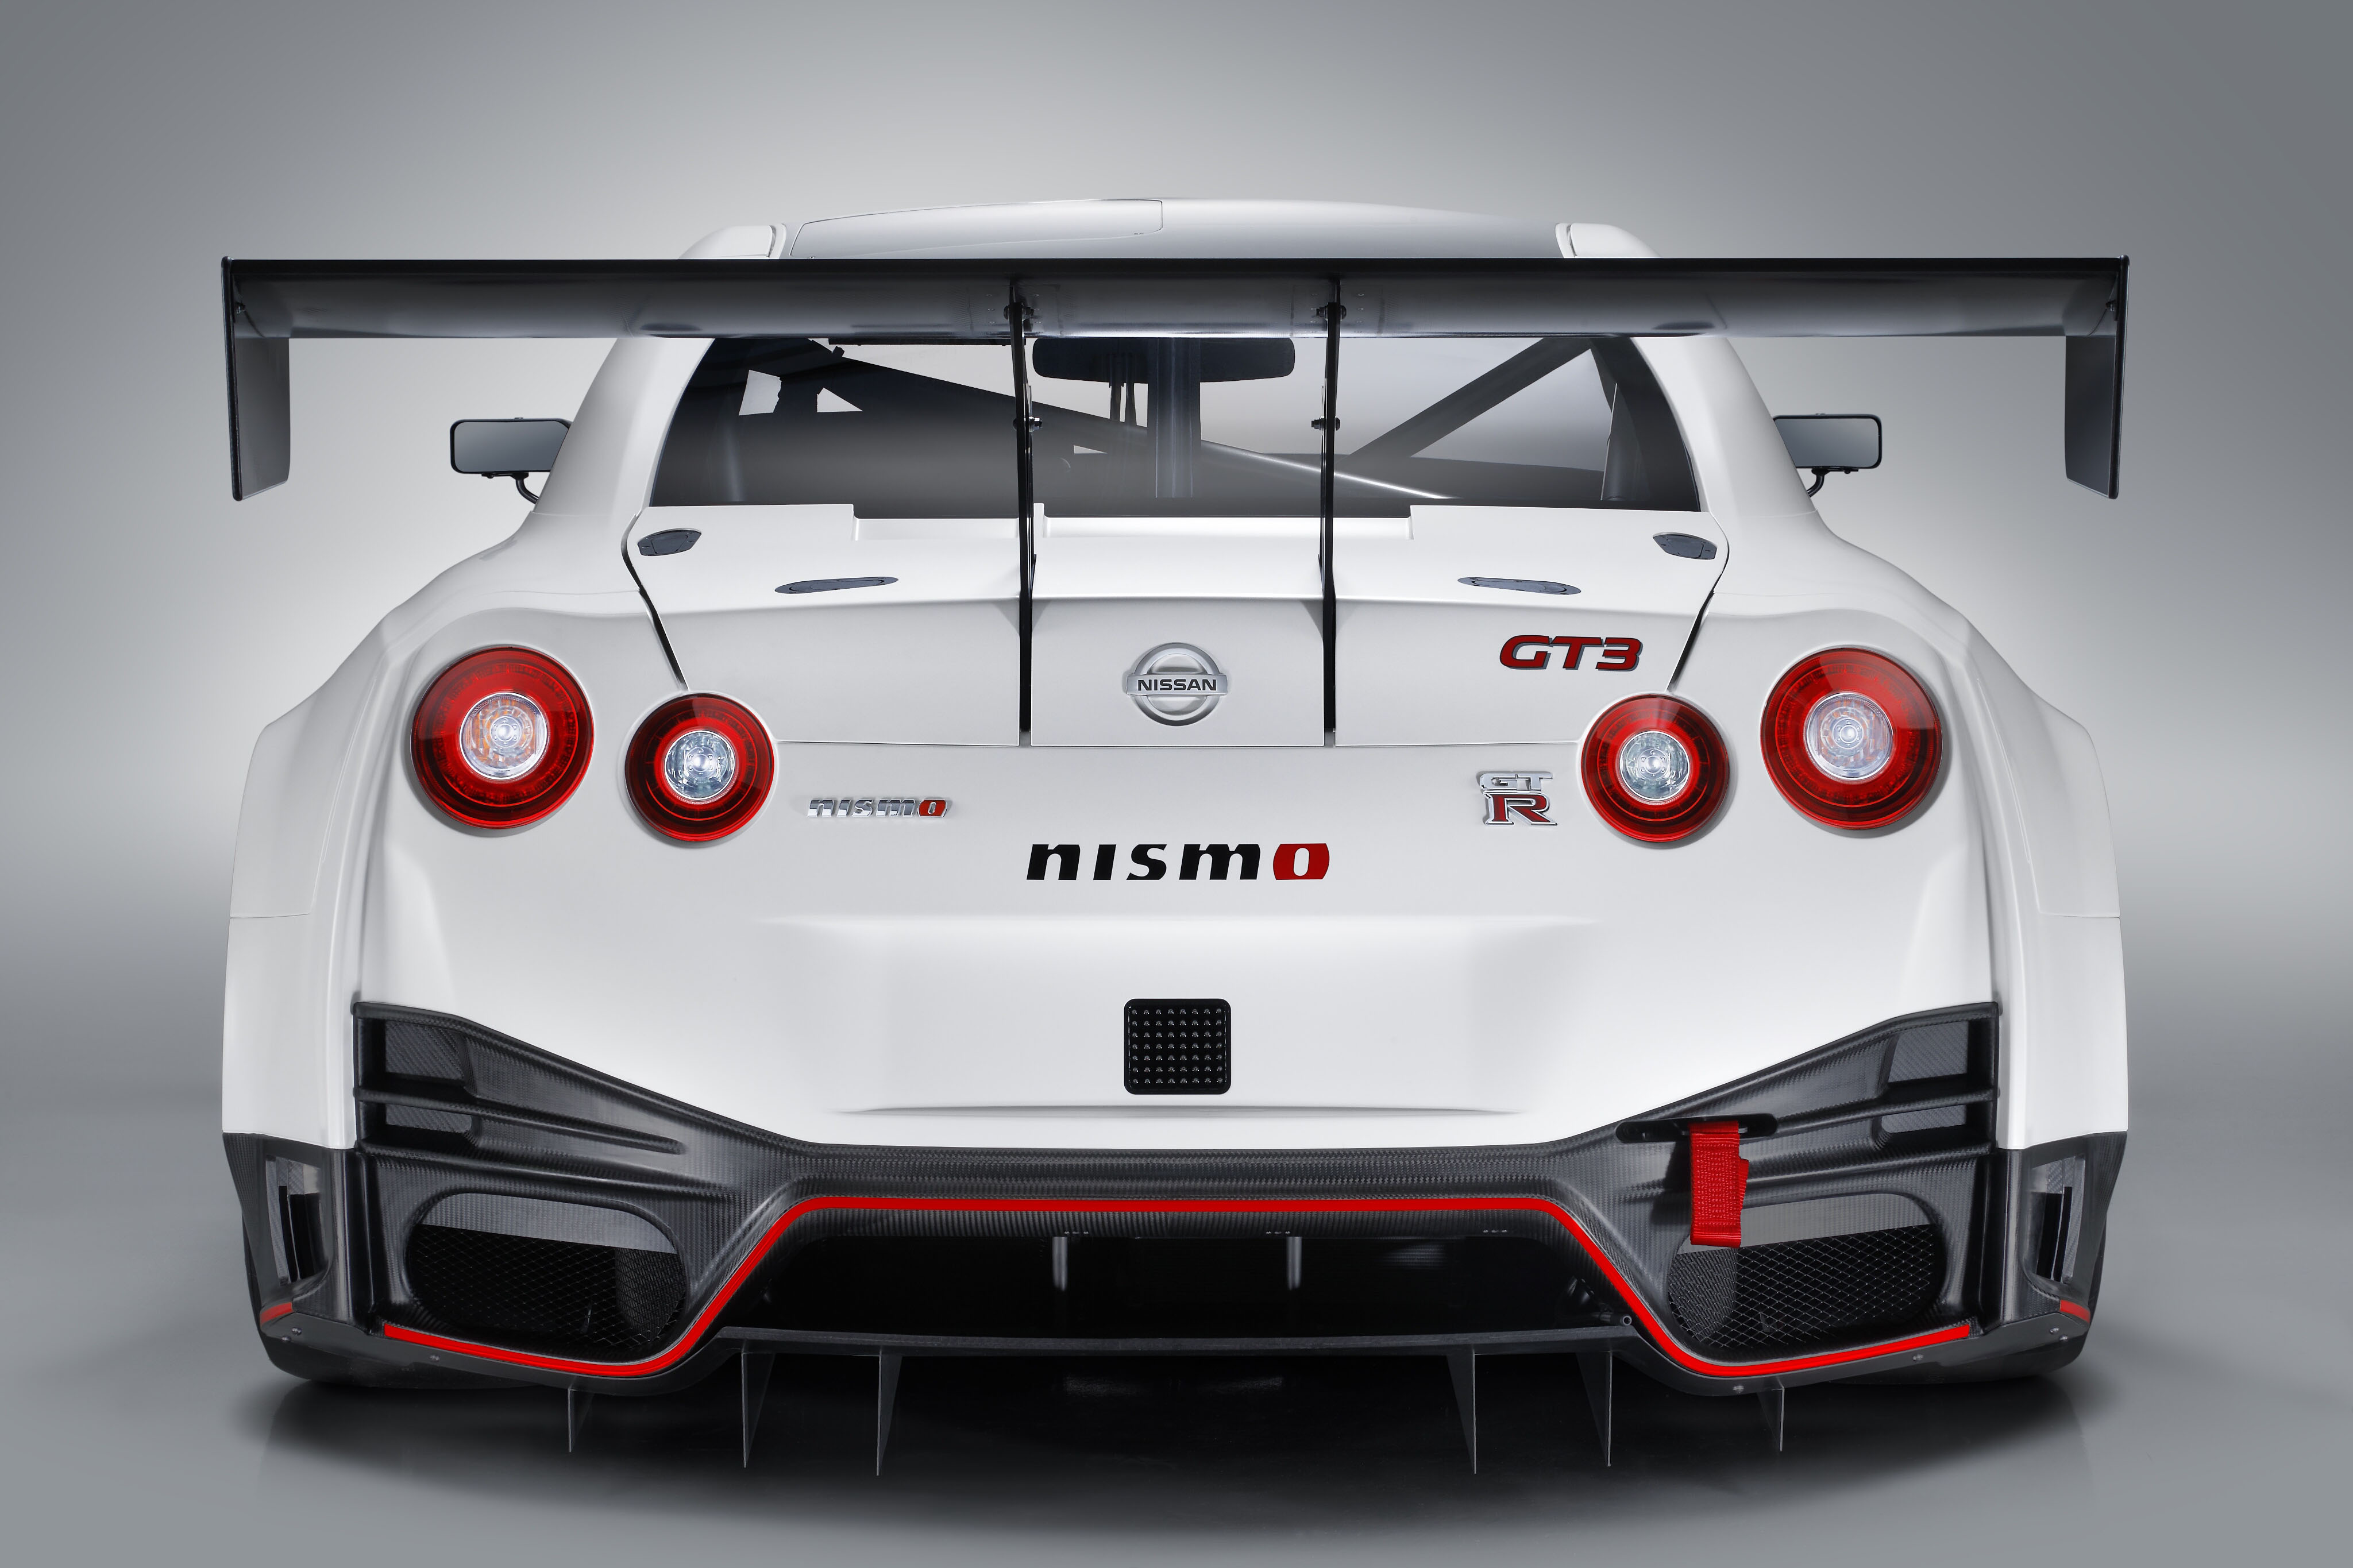 Nismo Nissan Gt R Gt3 2018 Rear 4k 4096x2730 Download Hd Wallpaper Wallpapertip